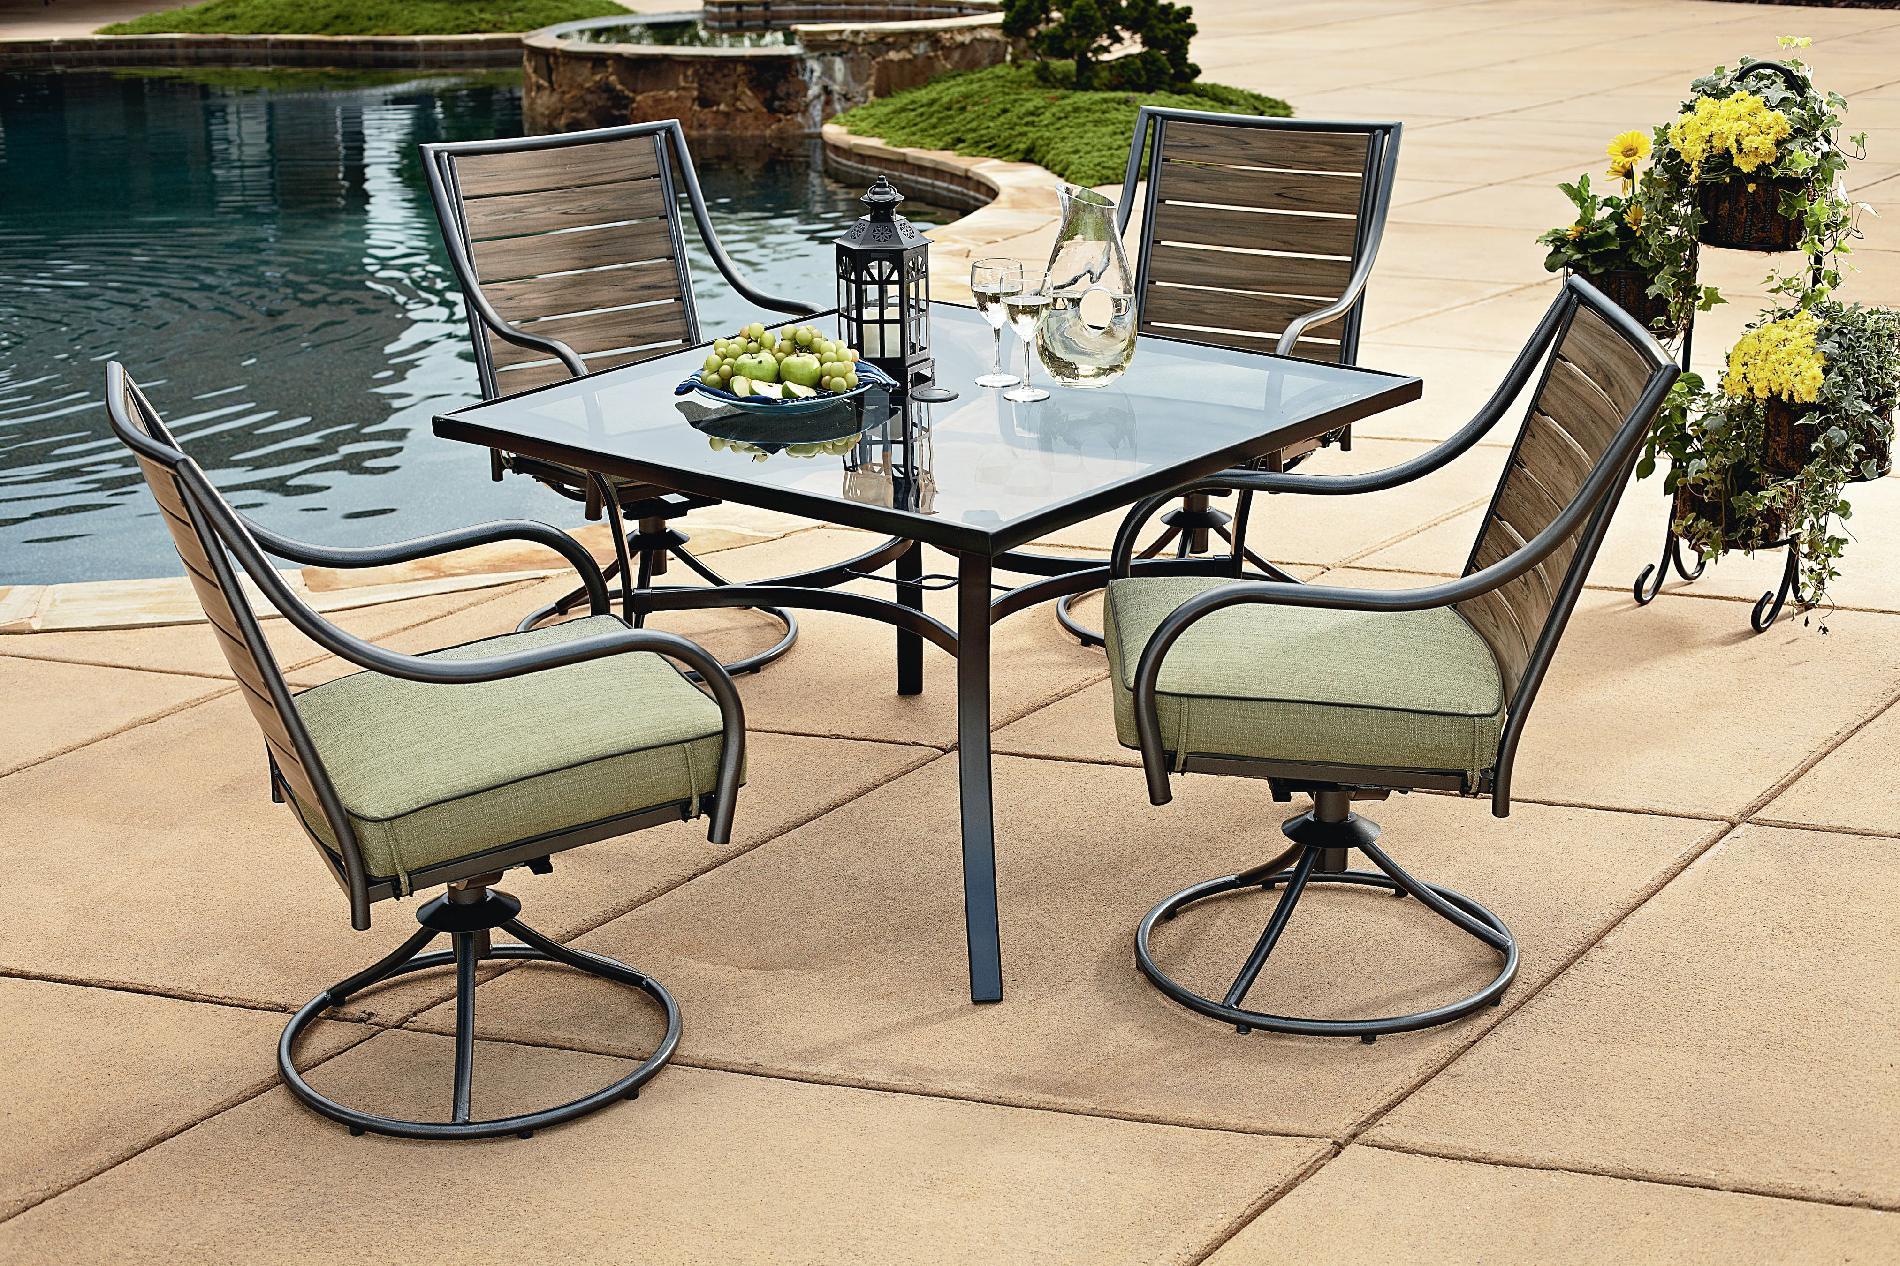 Garden Oasis - S13s4162r Brooks 5pc Patio Dining Set